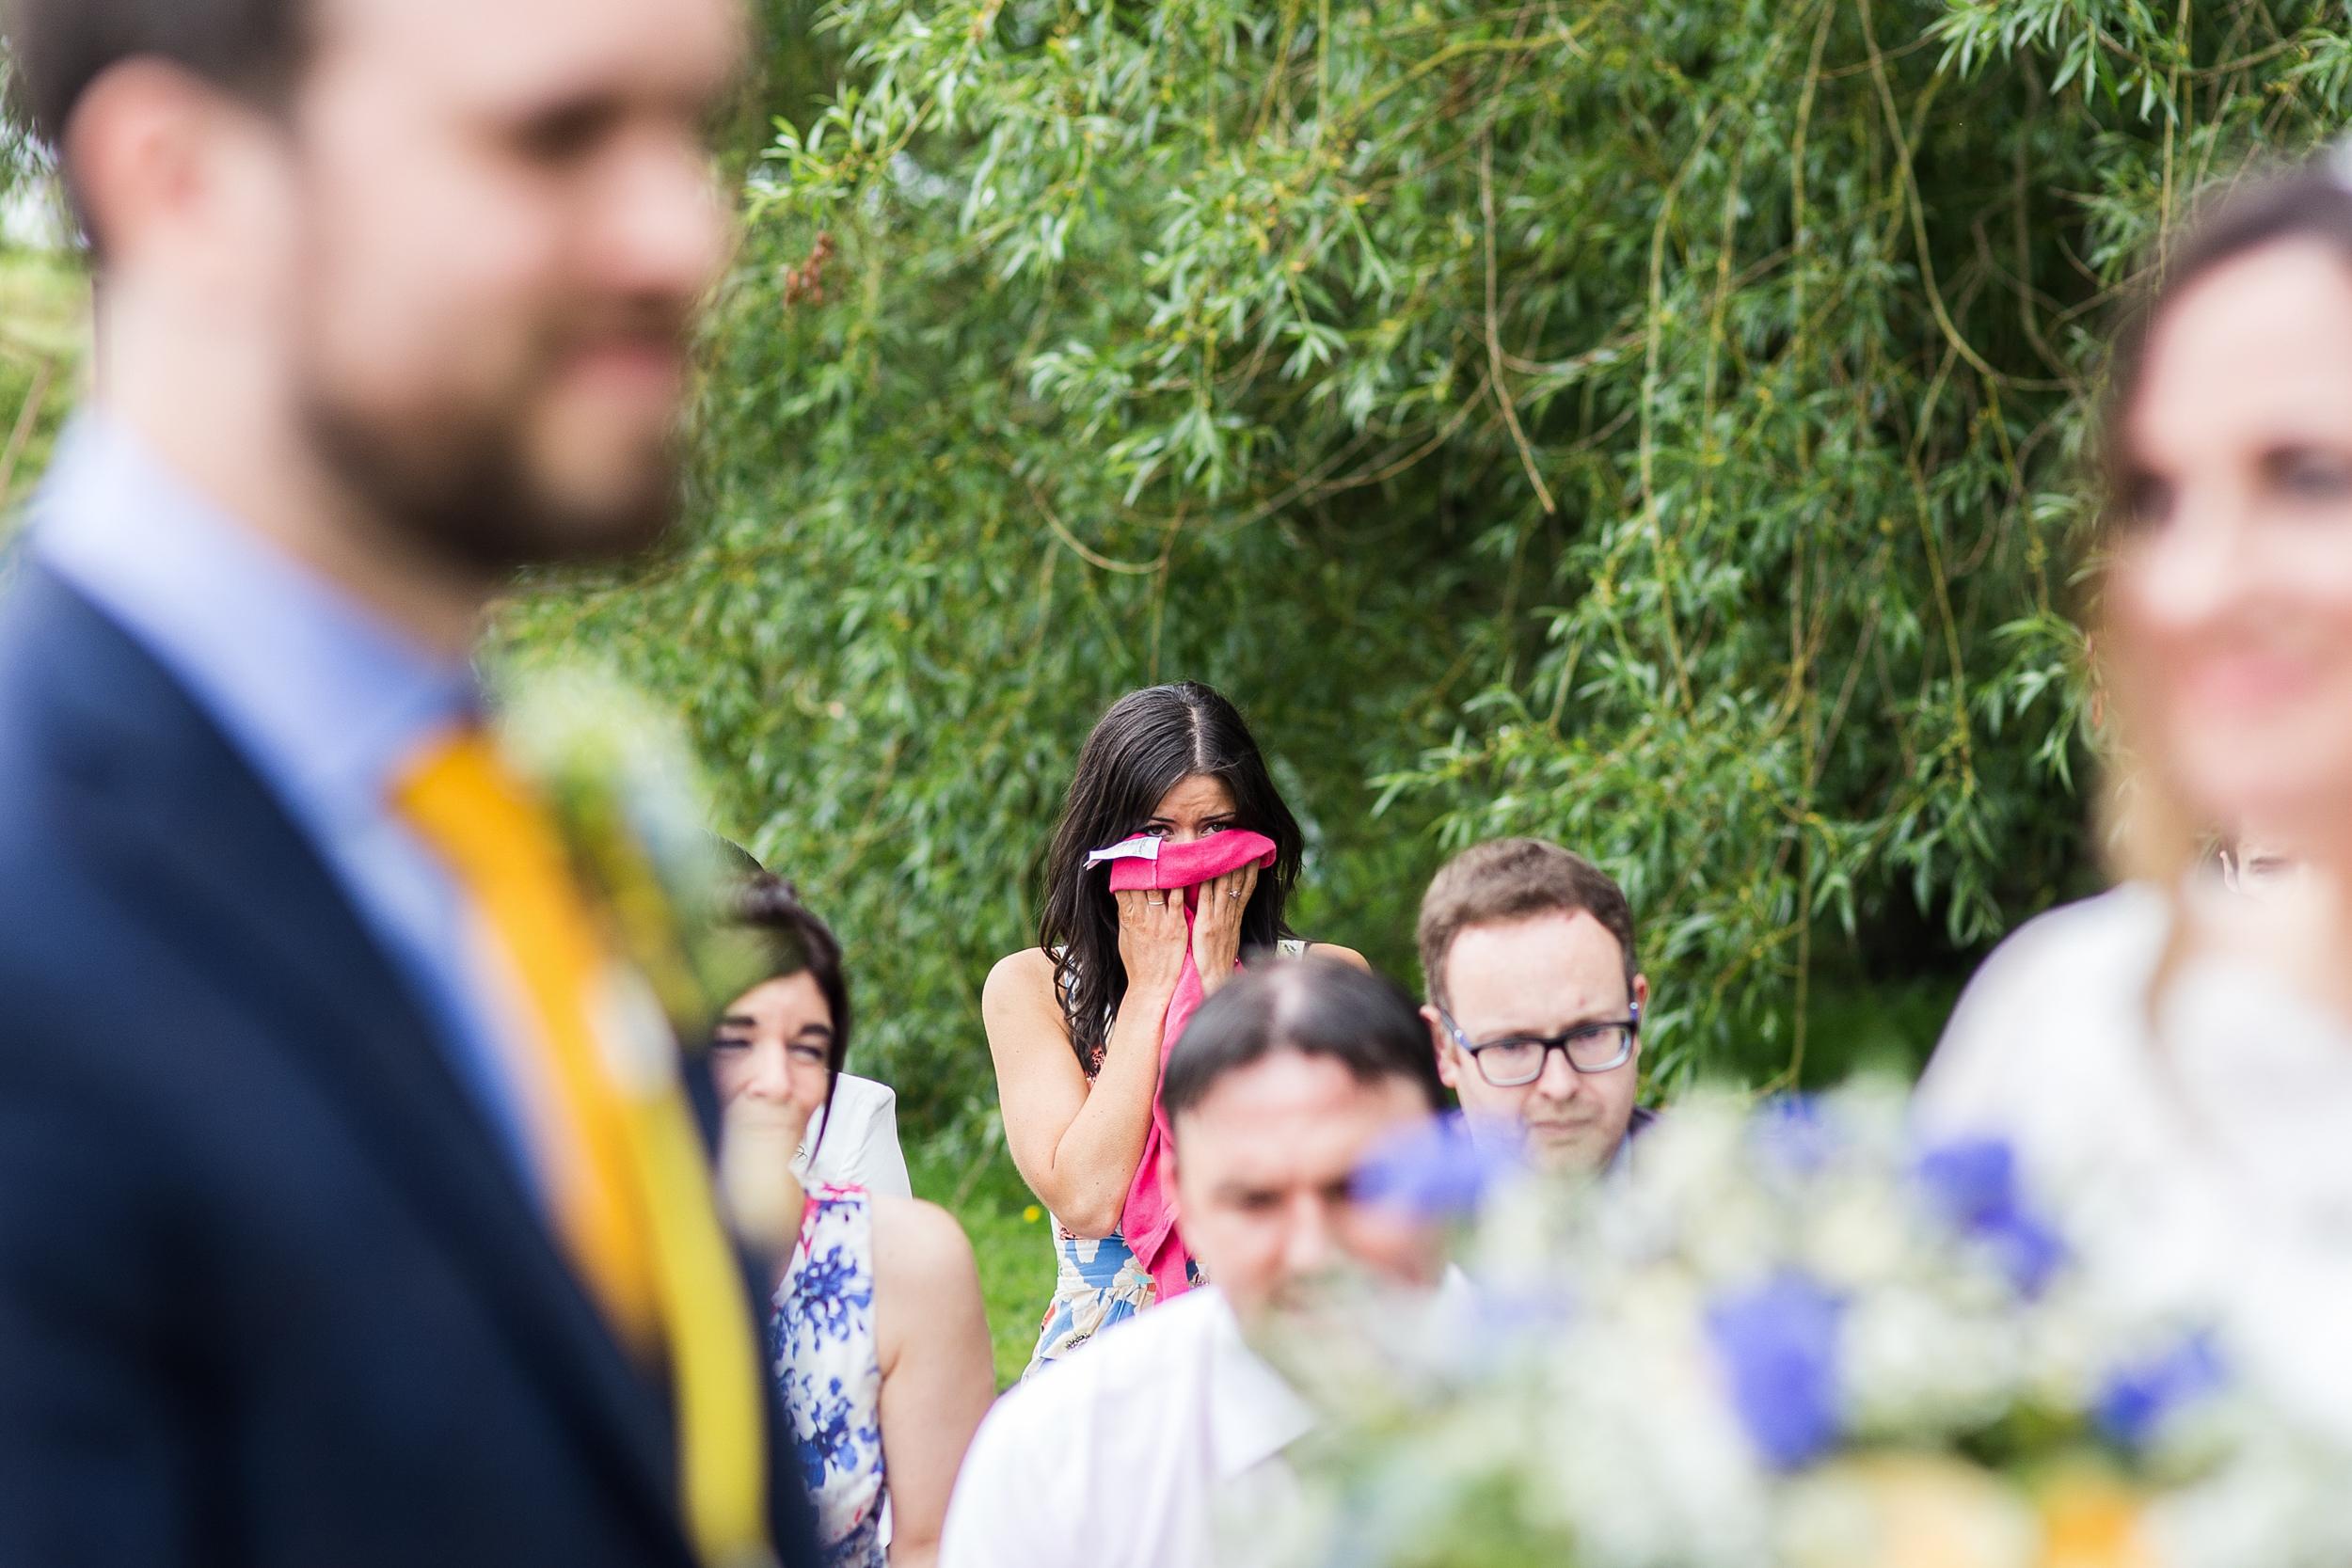 creative-wedding-photography-teesside-north-east-yorkshire-28.jpg